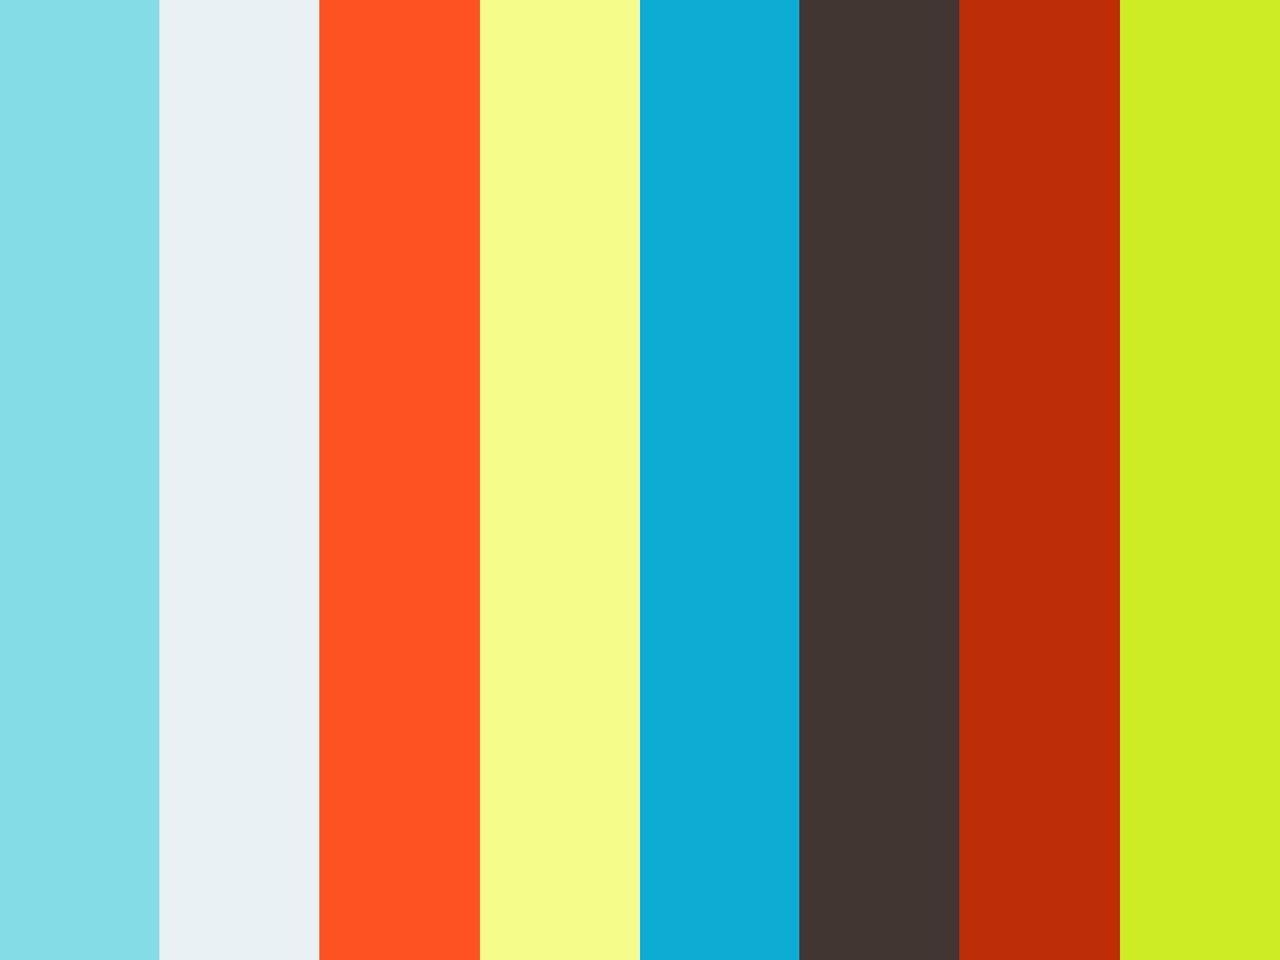 002735 - CORP - Ohlala BehaKlas - Tip 12 - Grote boezem